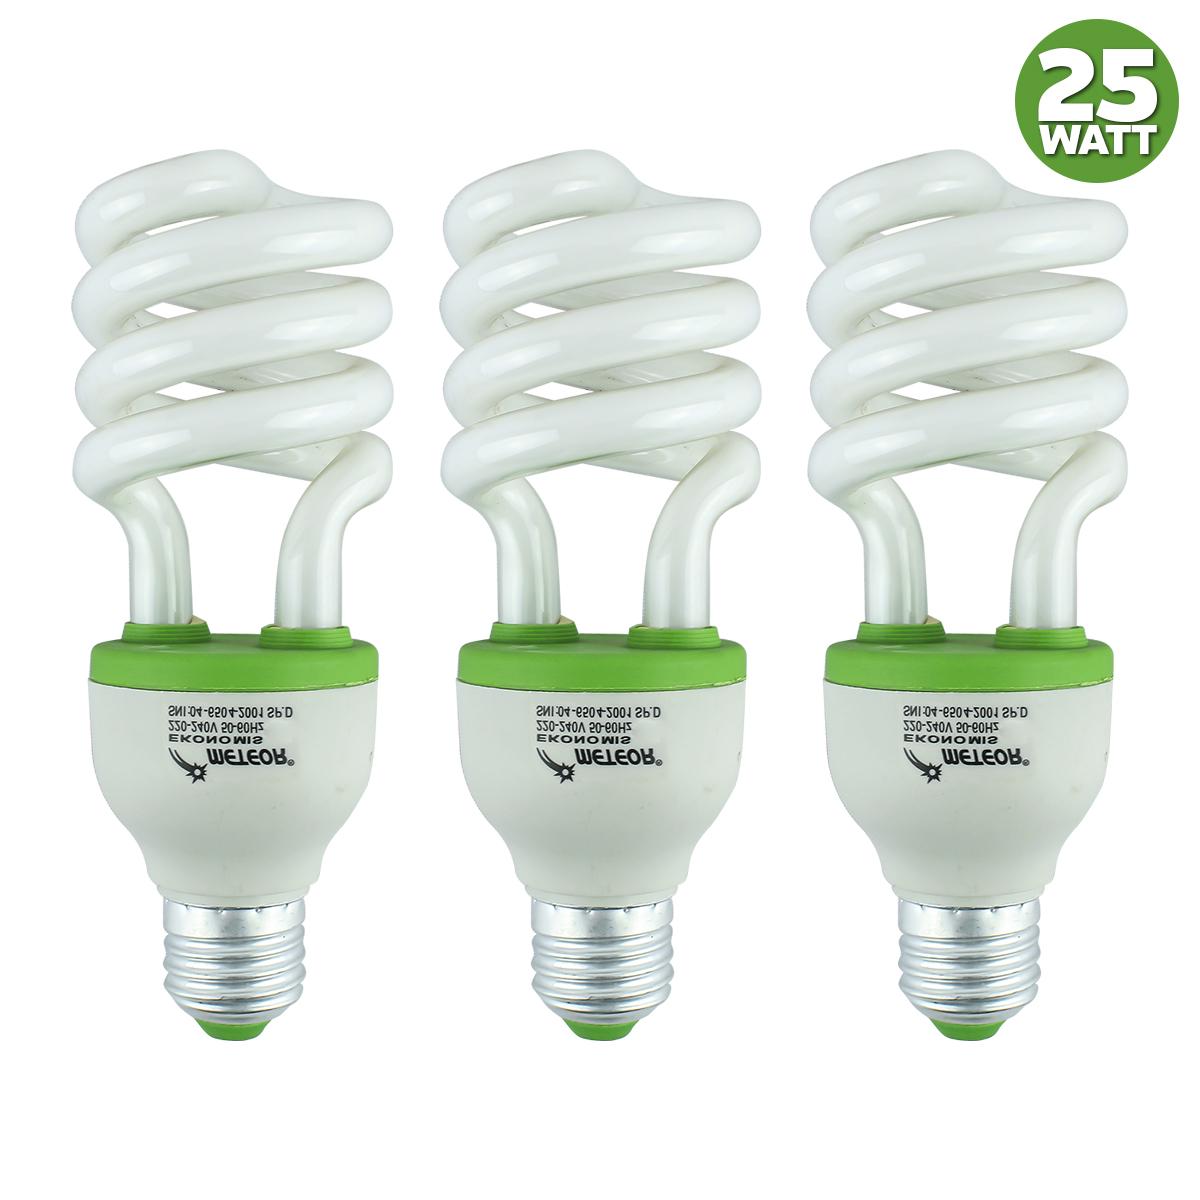 weitech lampu hemat energi spiral 3 pcs 35w/30w/25w putih